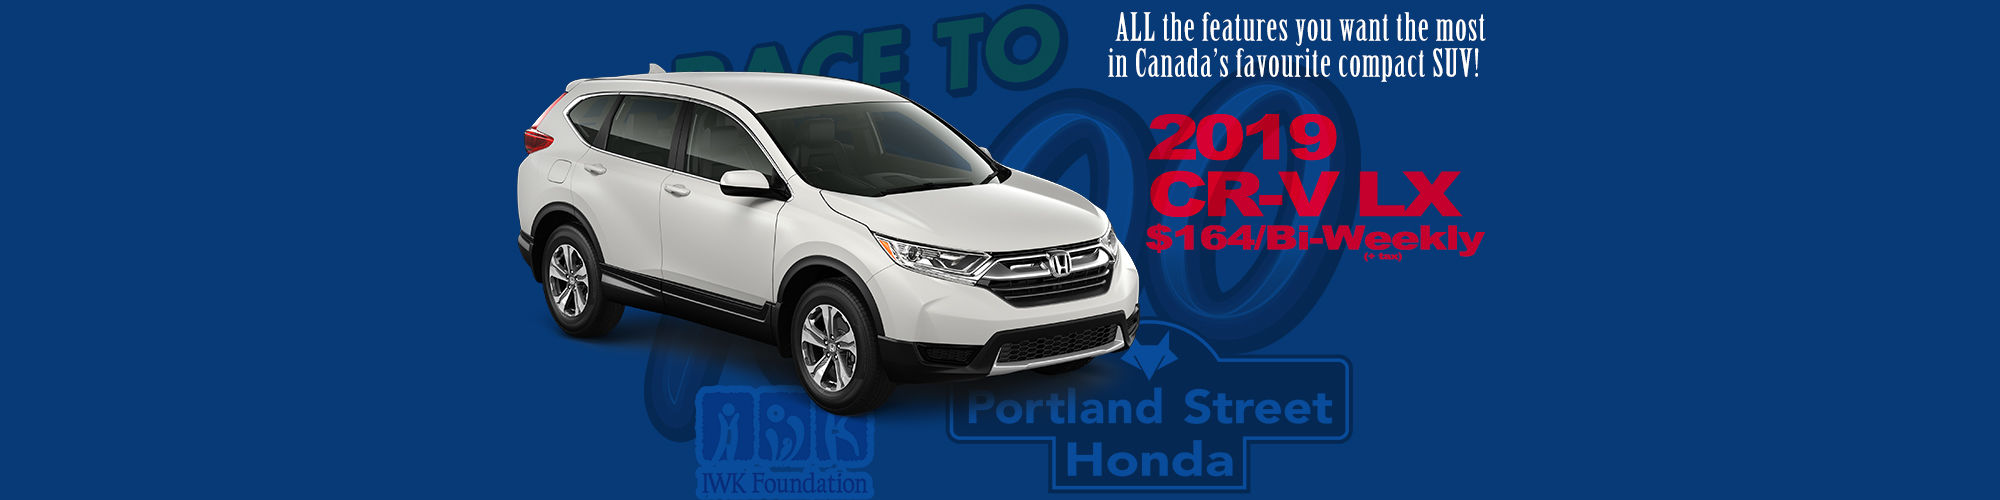 Honda CR-V $164/Bi-Weekly